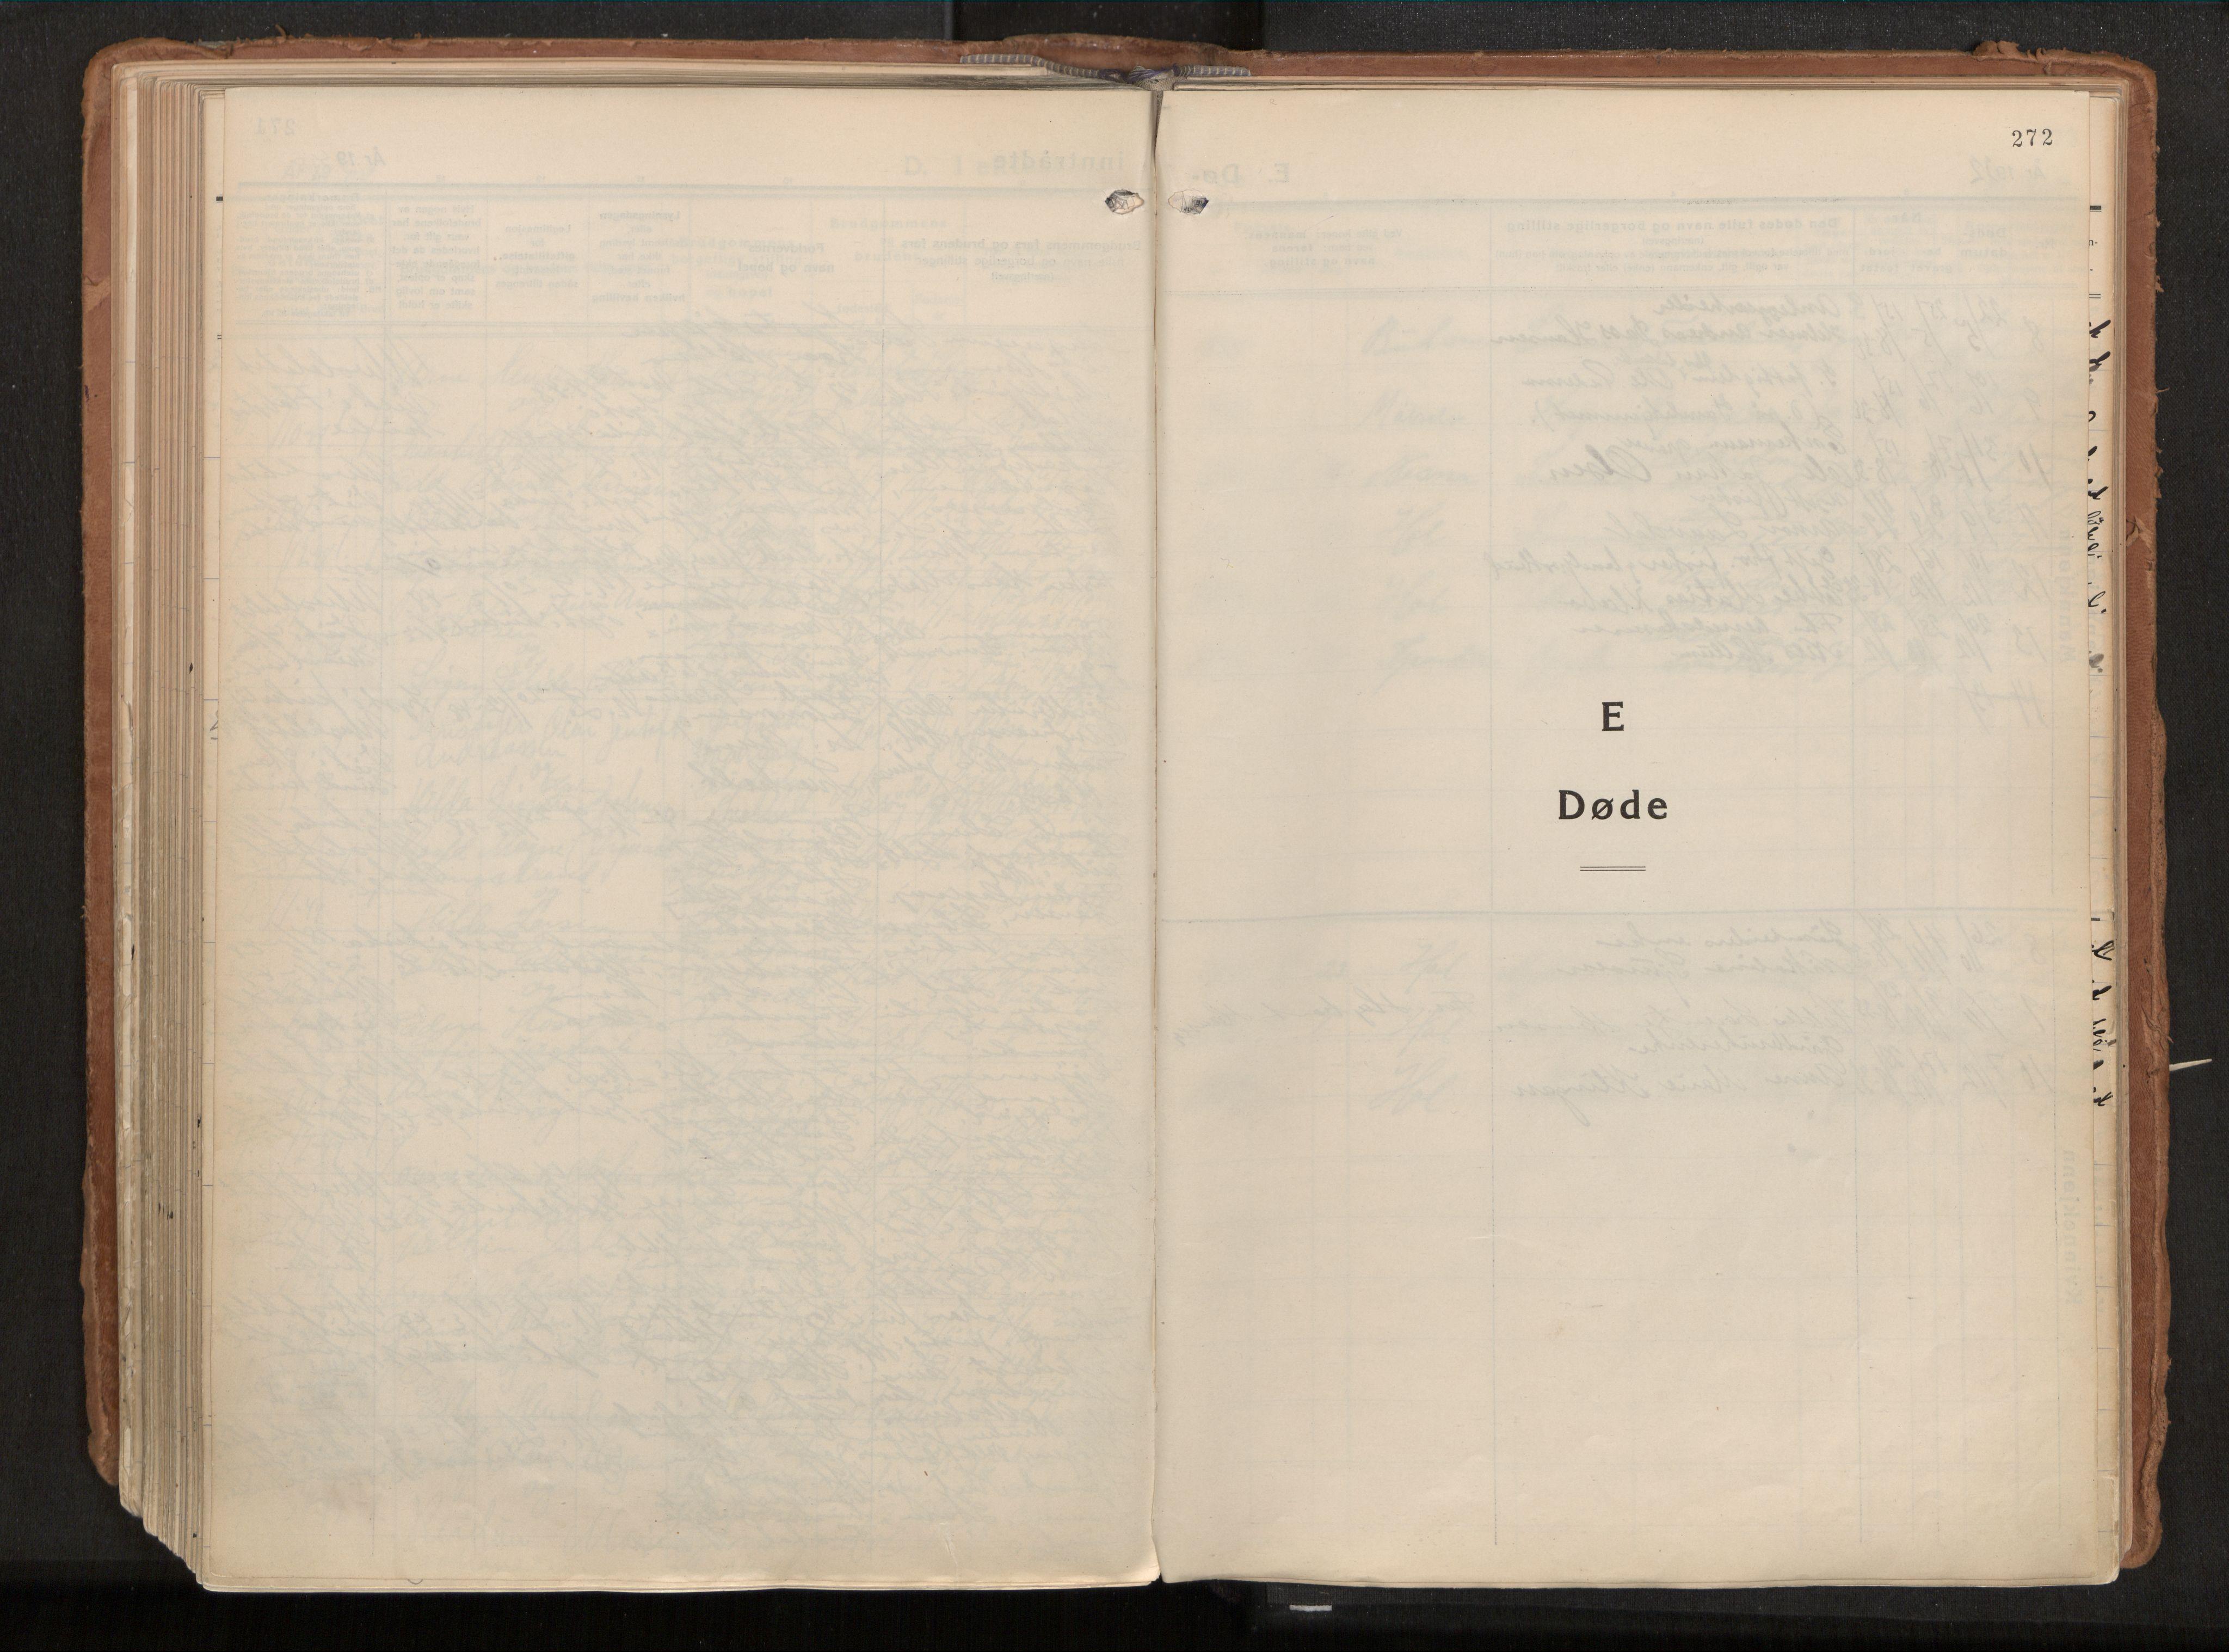 SAT, Ministerialprotokoller, klokkerbøker og fødselsregistre - Nordland, 882/L1182: Ministerialbok nr. 882A04, 1932-1950, s. 272